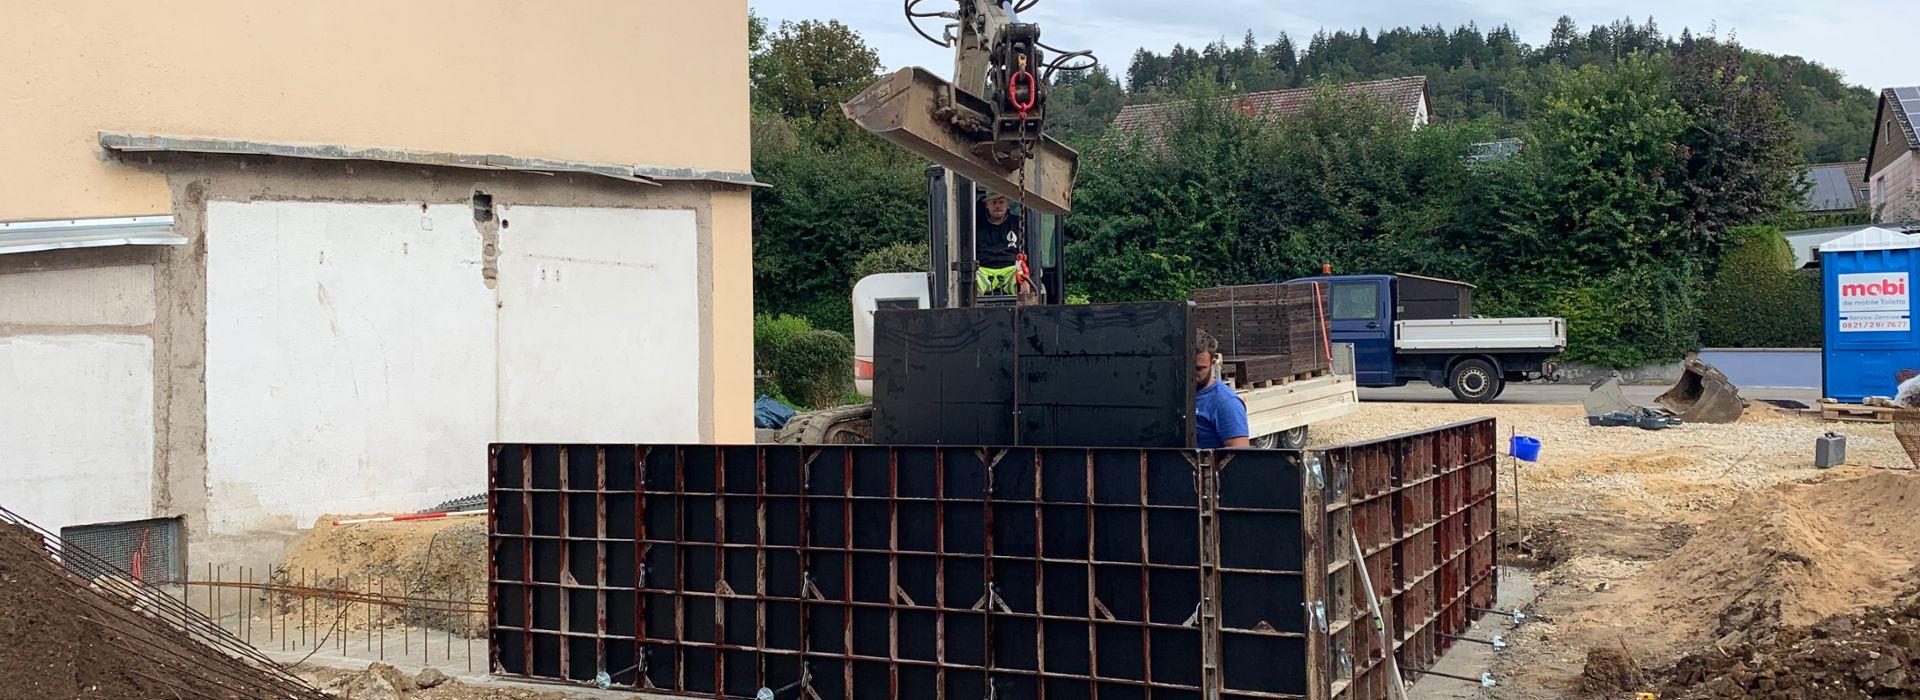 Betonbau und Fundamente